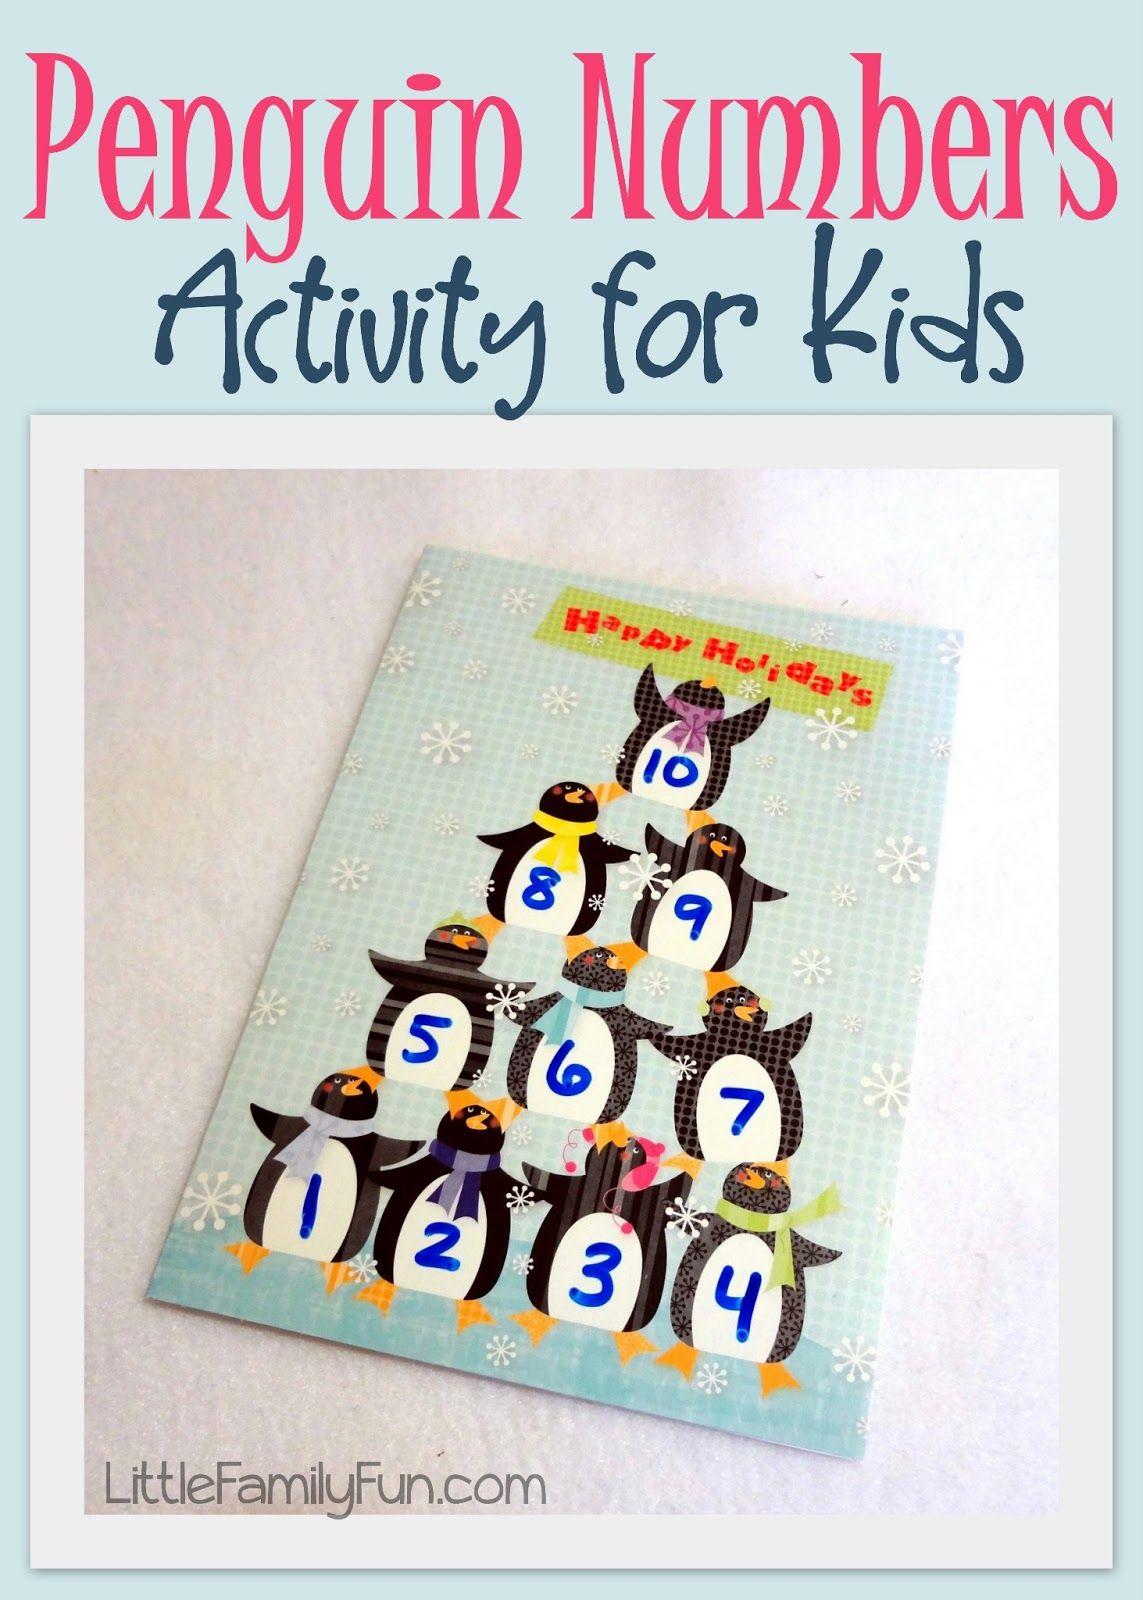 Penguin Numbers Activity